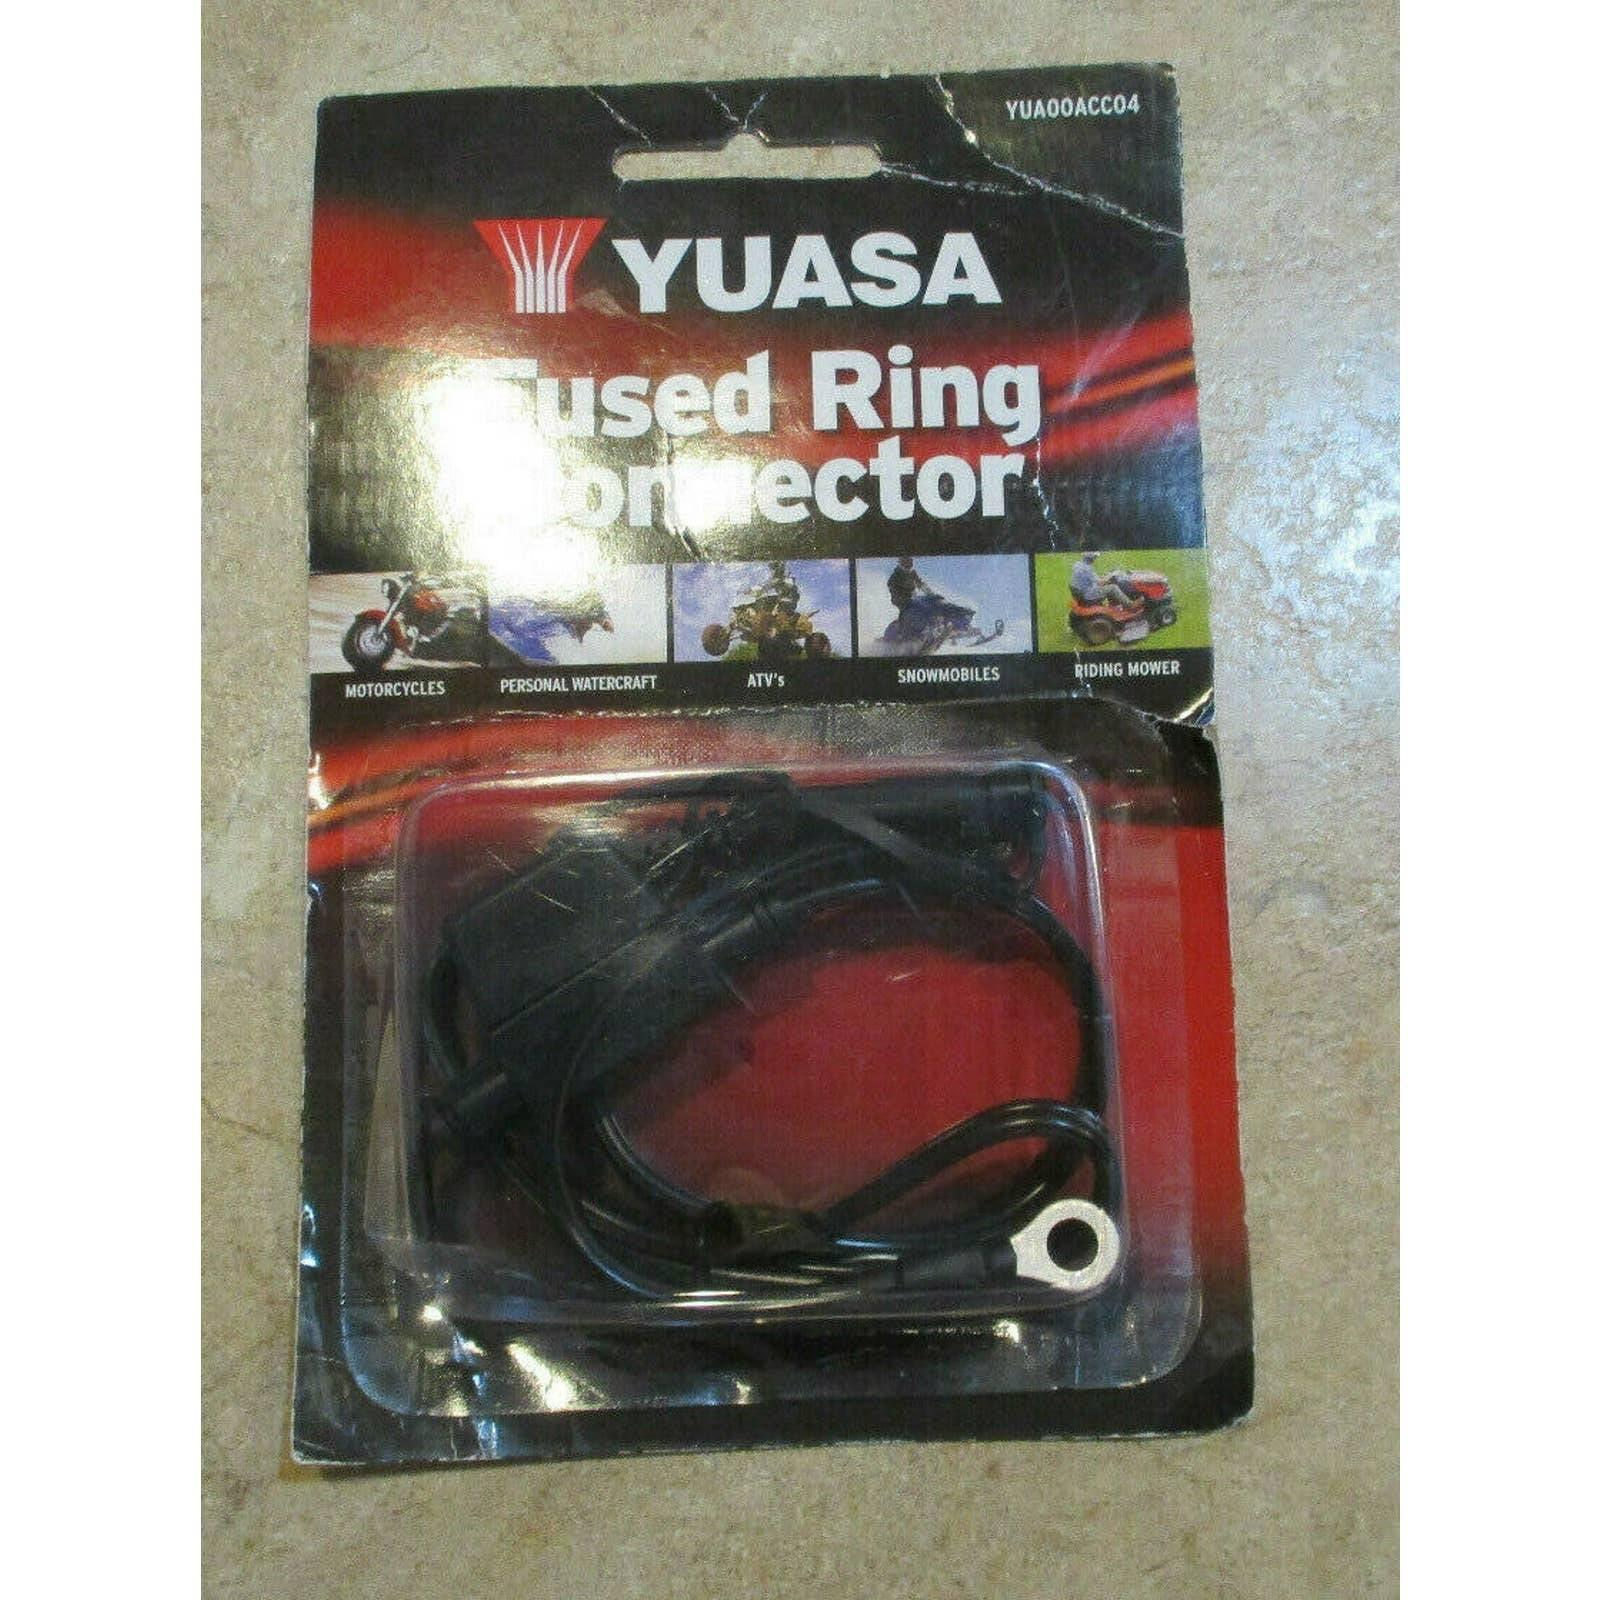 Yuasa Fused Ring Connector   YUA00ACC04